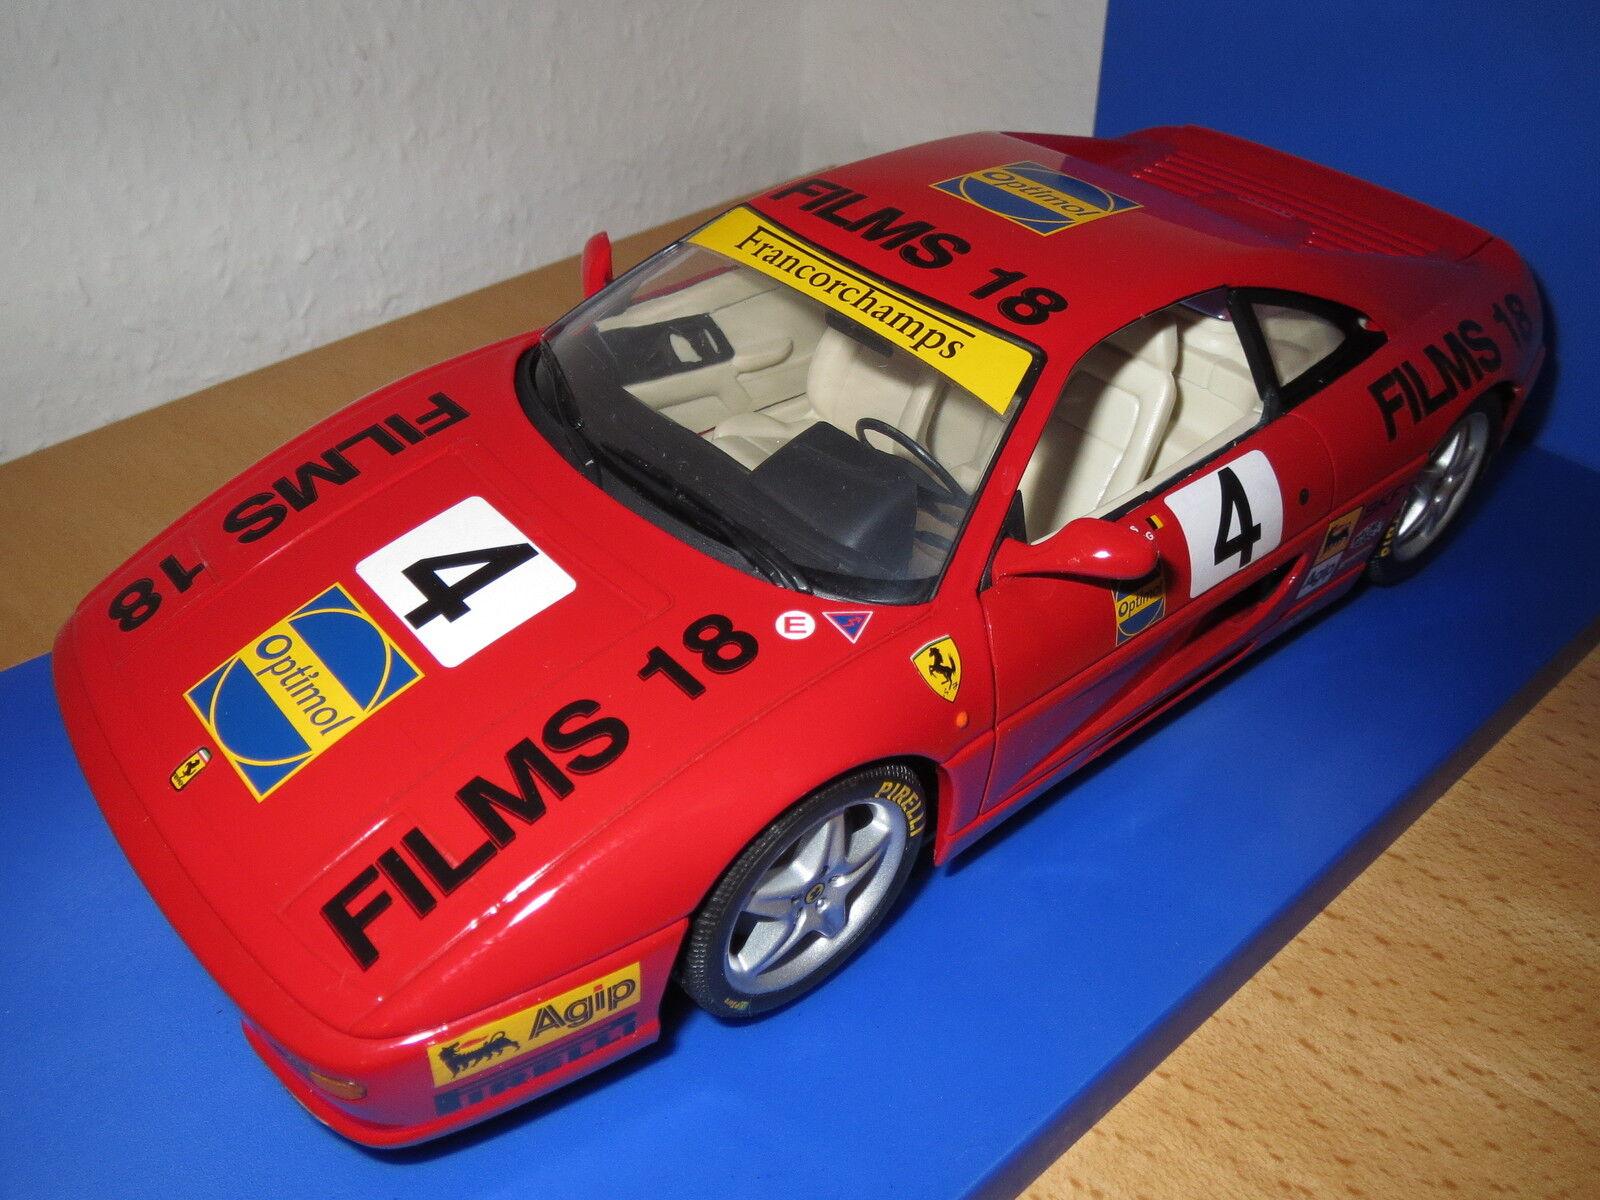 Privé transformation  Ferrari f355 Berlinetta, film 18, Francorchamps race,  4,1 18, base  ut